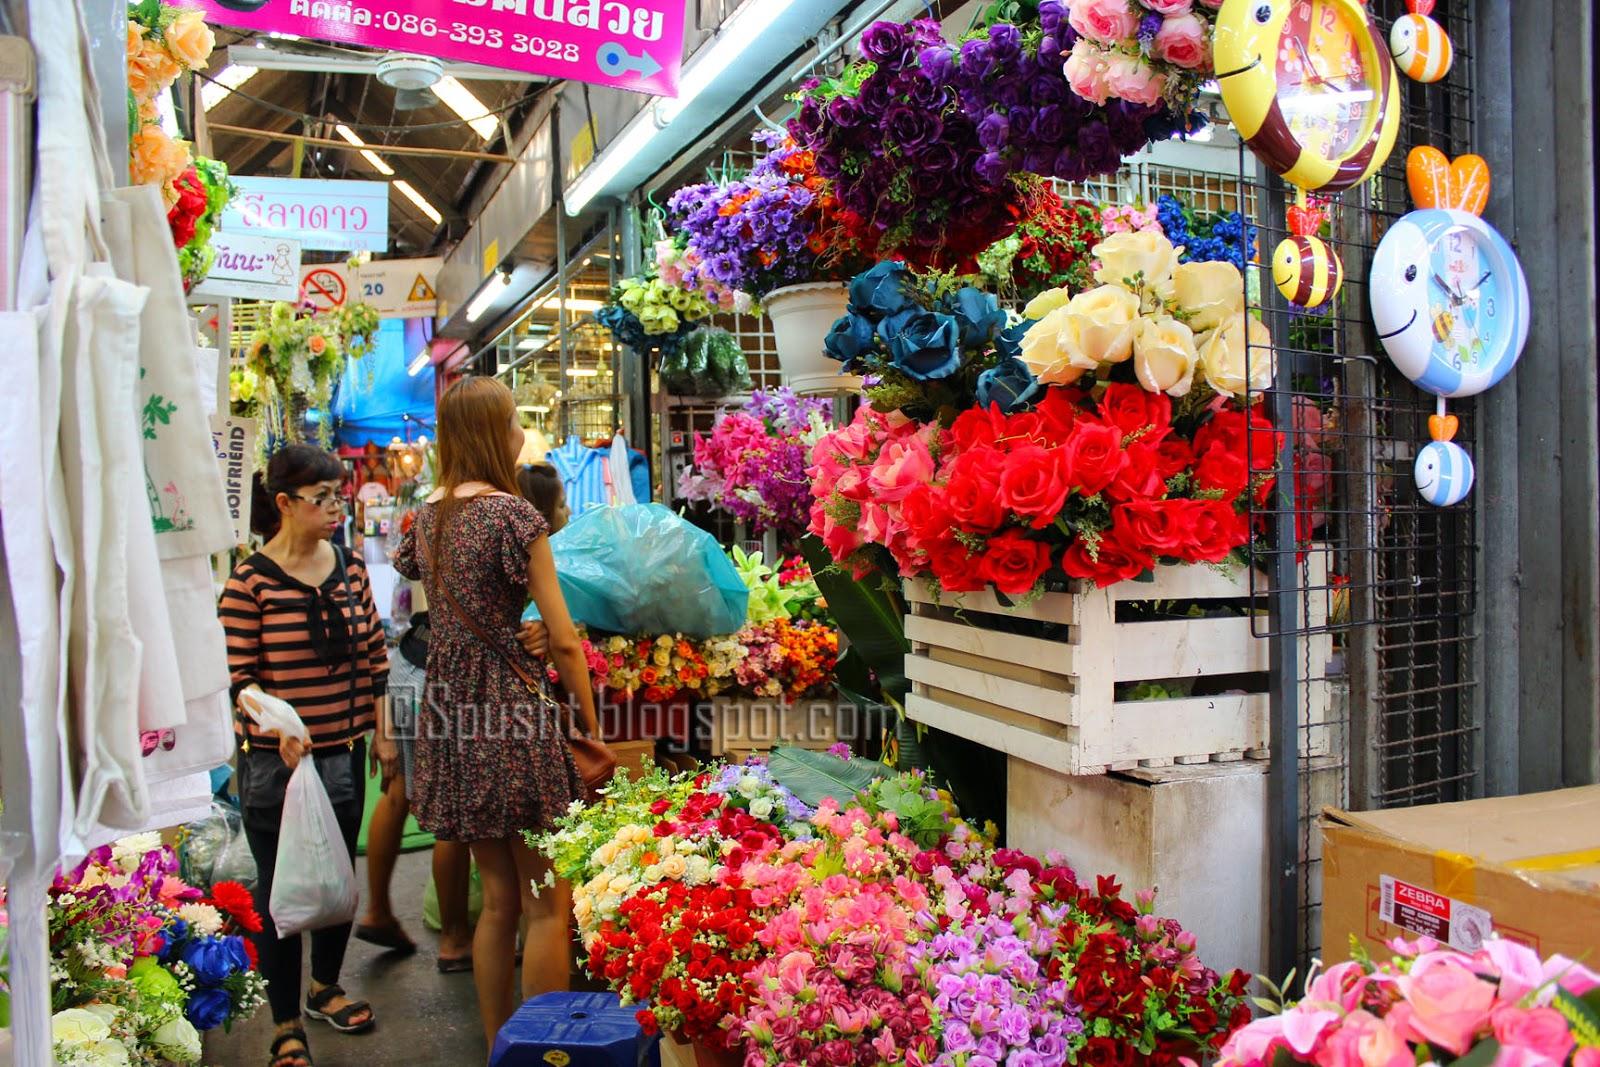 Spusht Chatuchak Market Jatujak Jj Market Same Thing